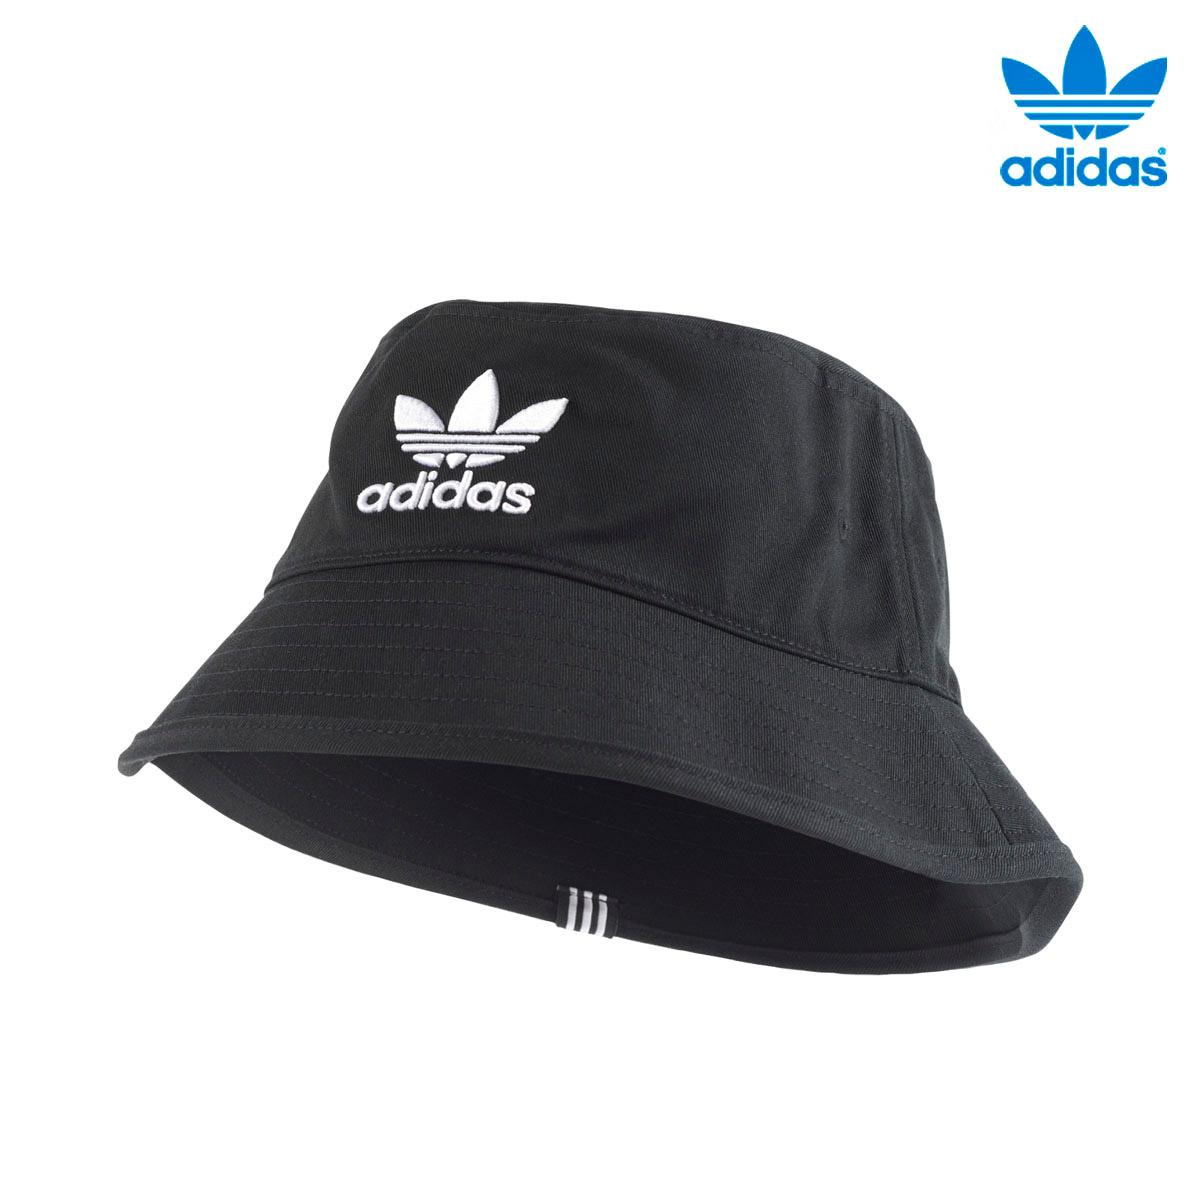 official supplier release date: special sales adidas Originals BUCKET HAT AC (Adidas original Suva blanket hat AC) BLACK  18SS-I